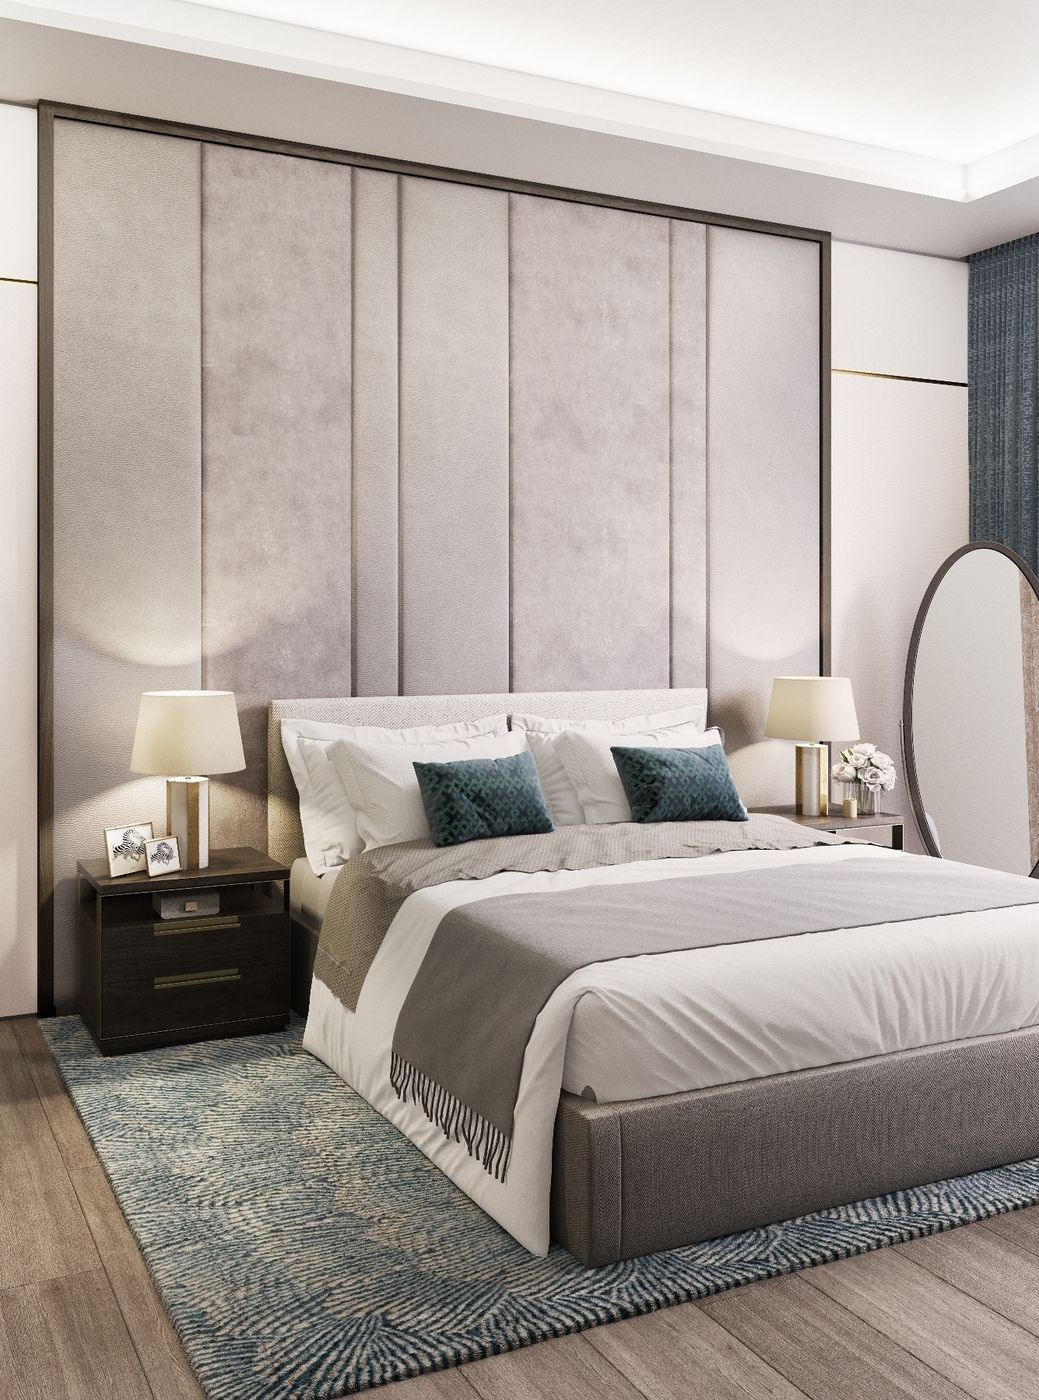 Interior Design Of Bed Rooms: Modern Bedroom Furniture, Luxurious Bedrooms